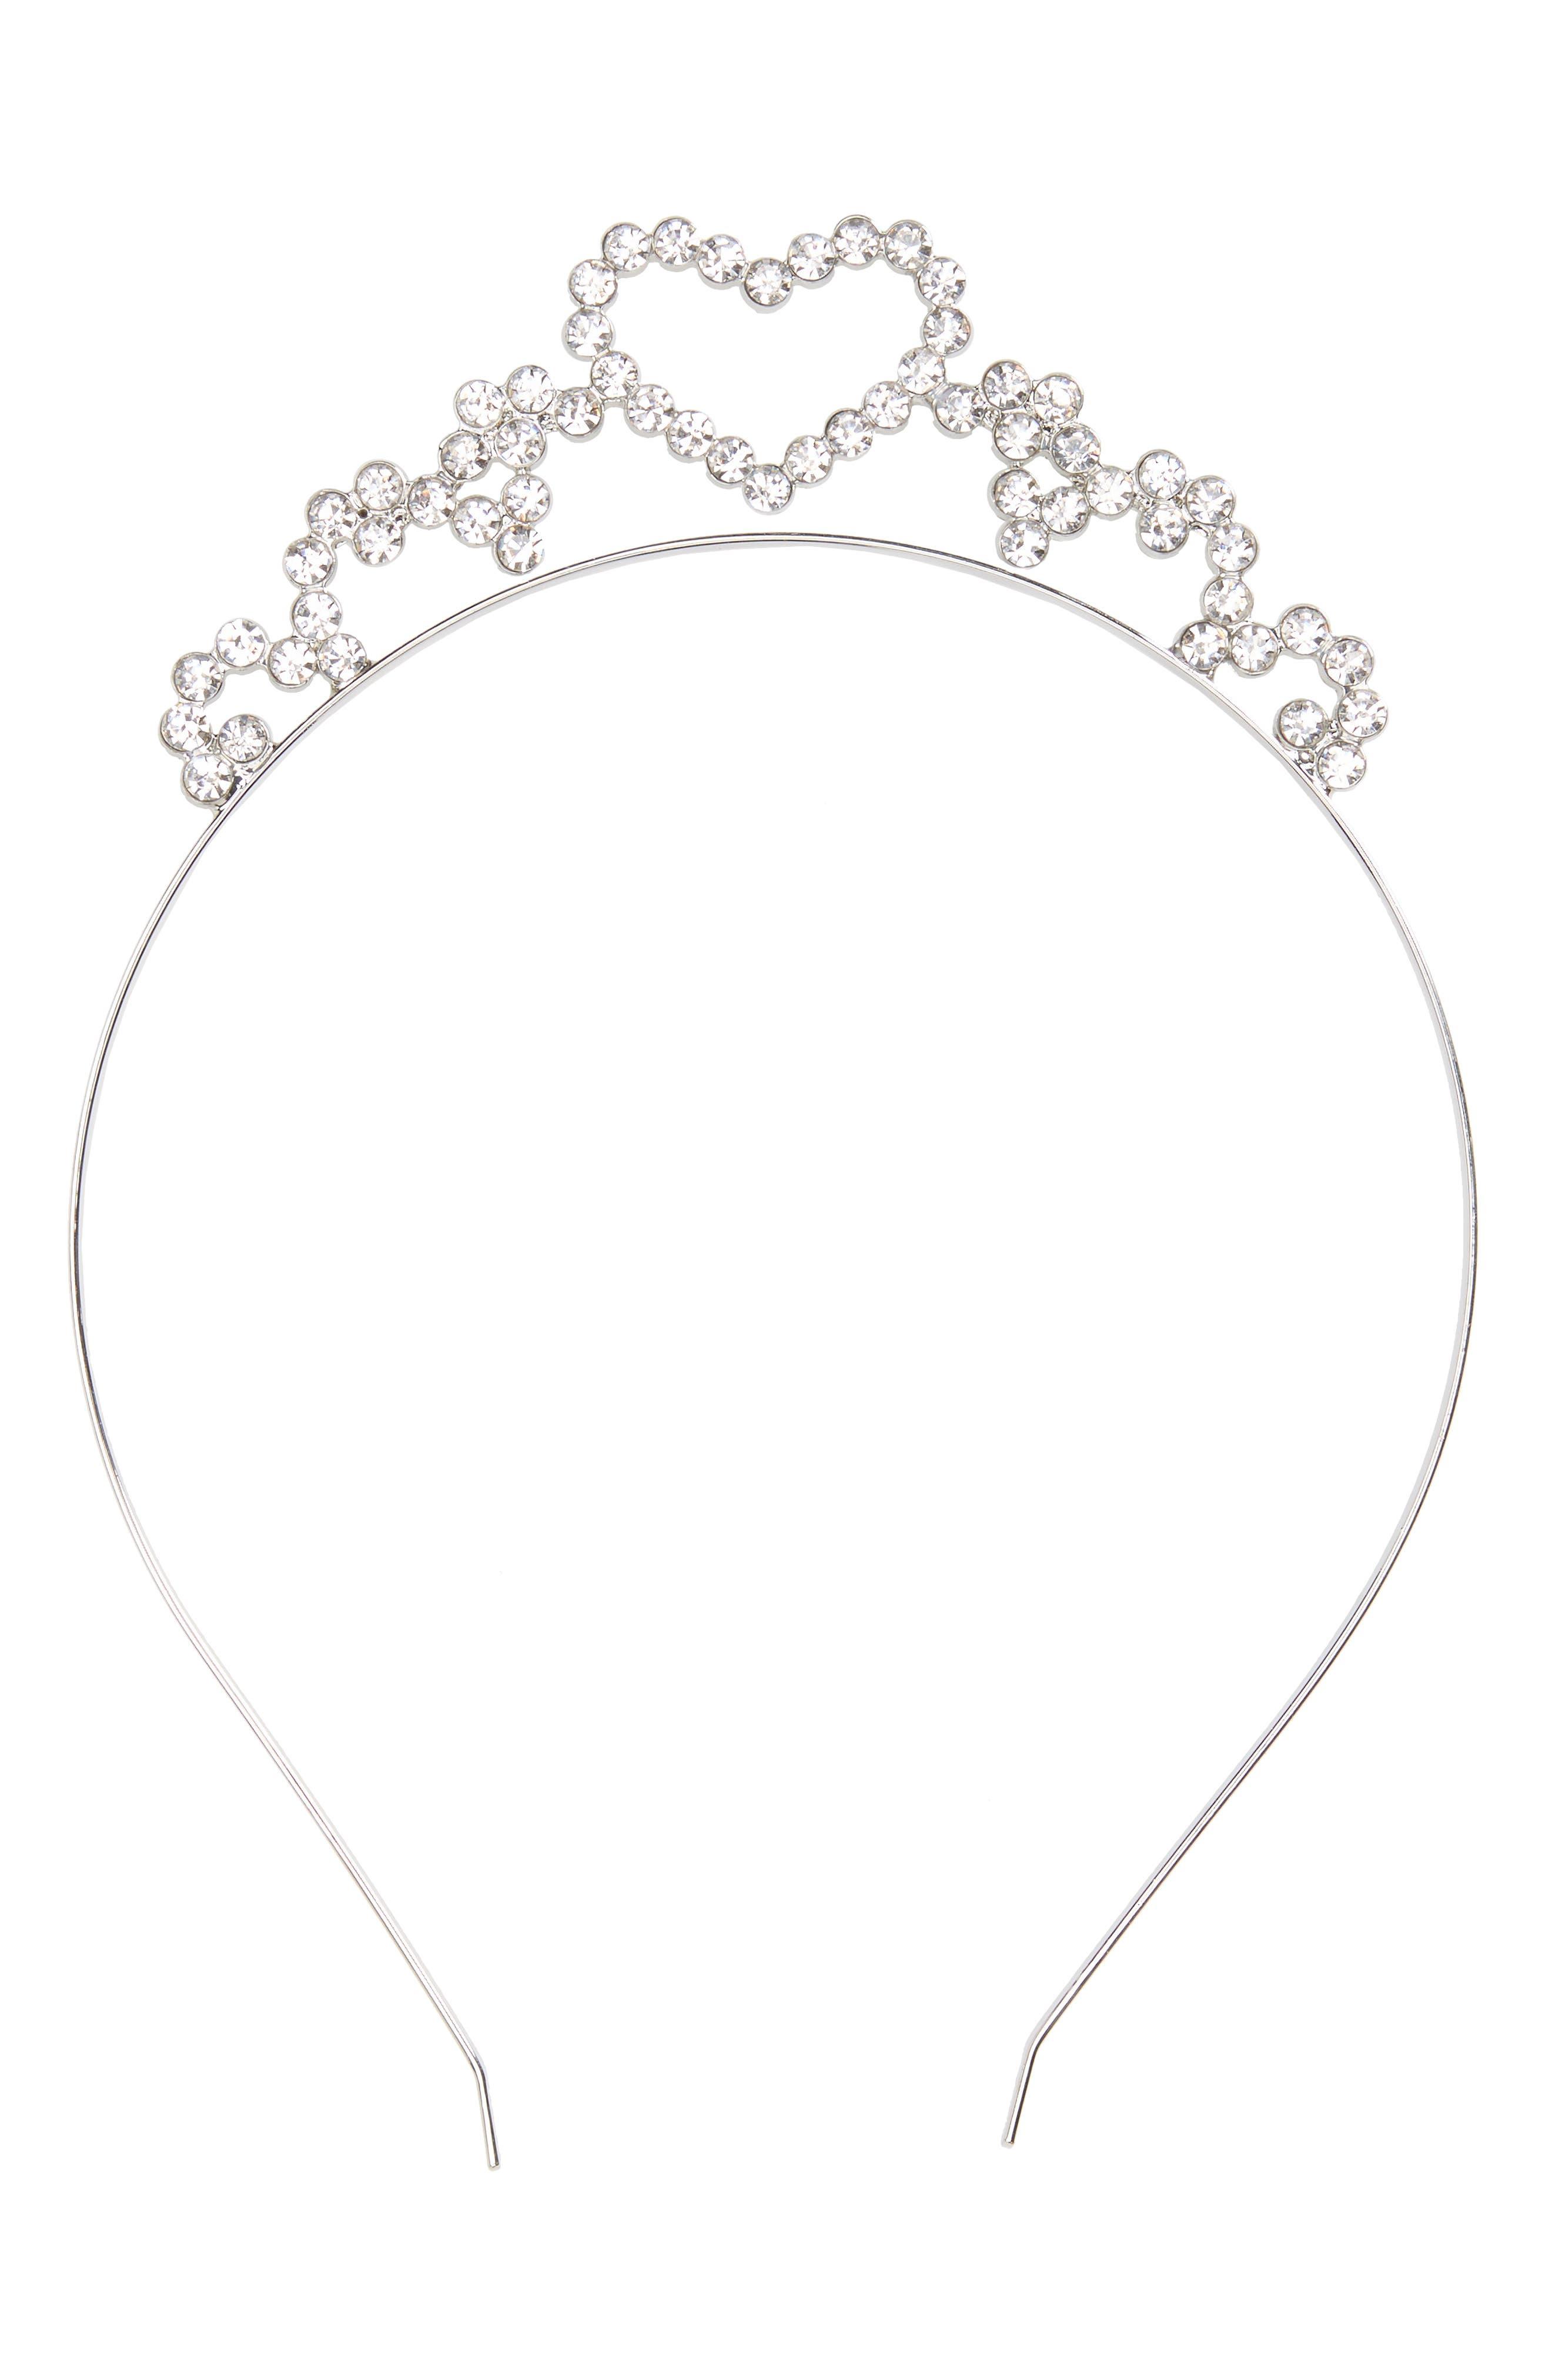 Accessory Collective Crystal Heart Headband,                         Main,                         color, Silver